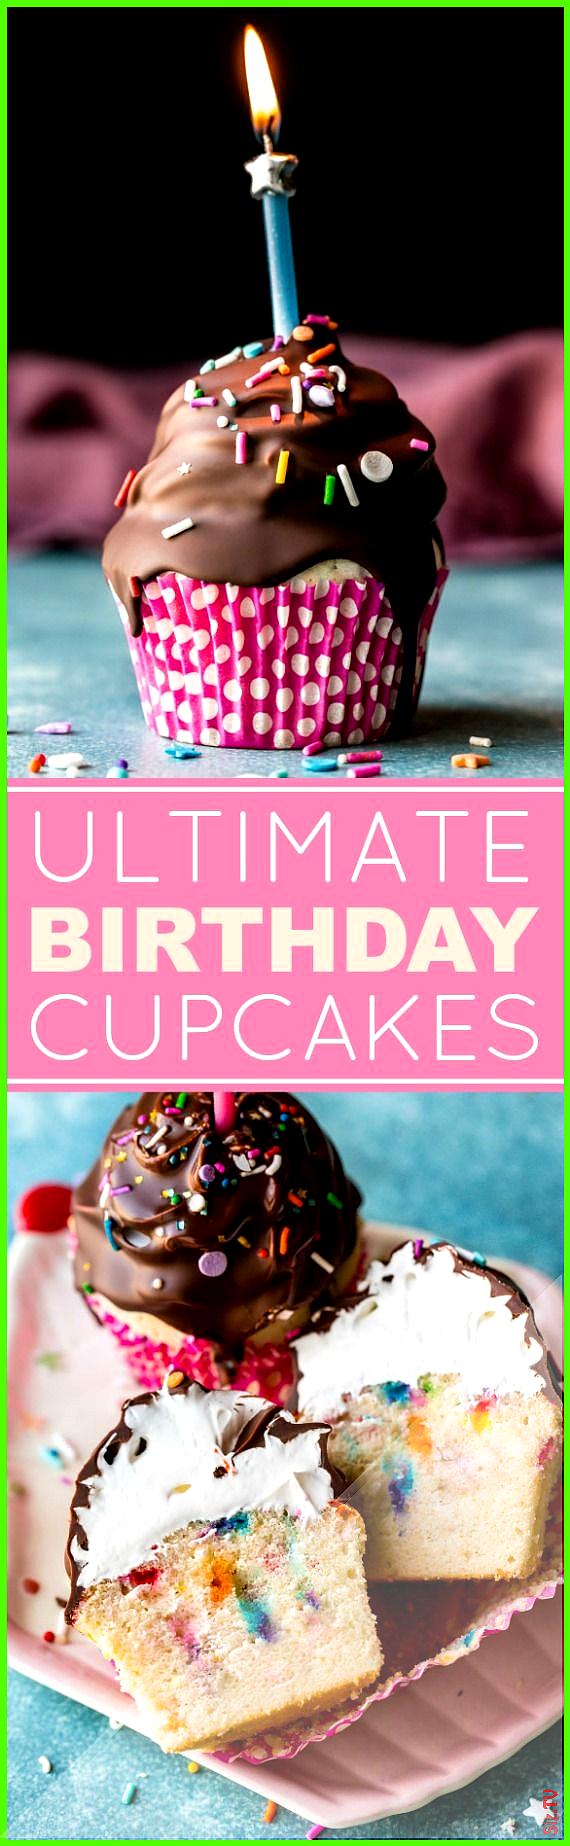 cupcake0779